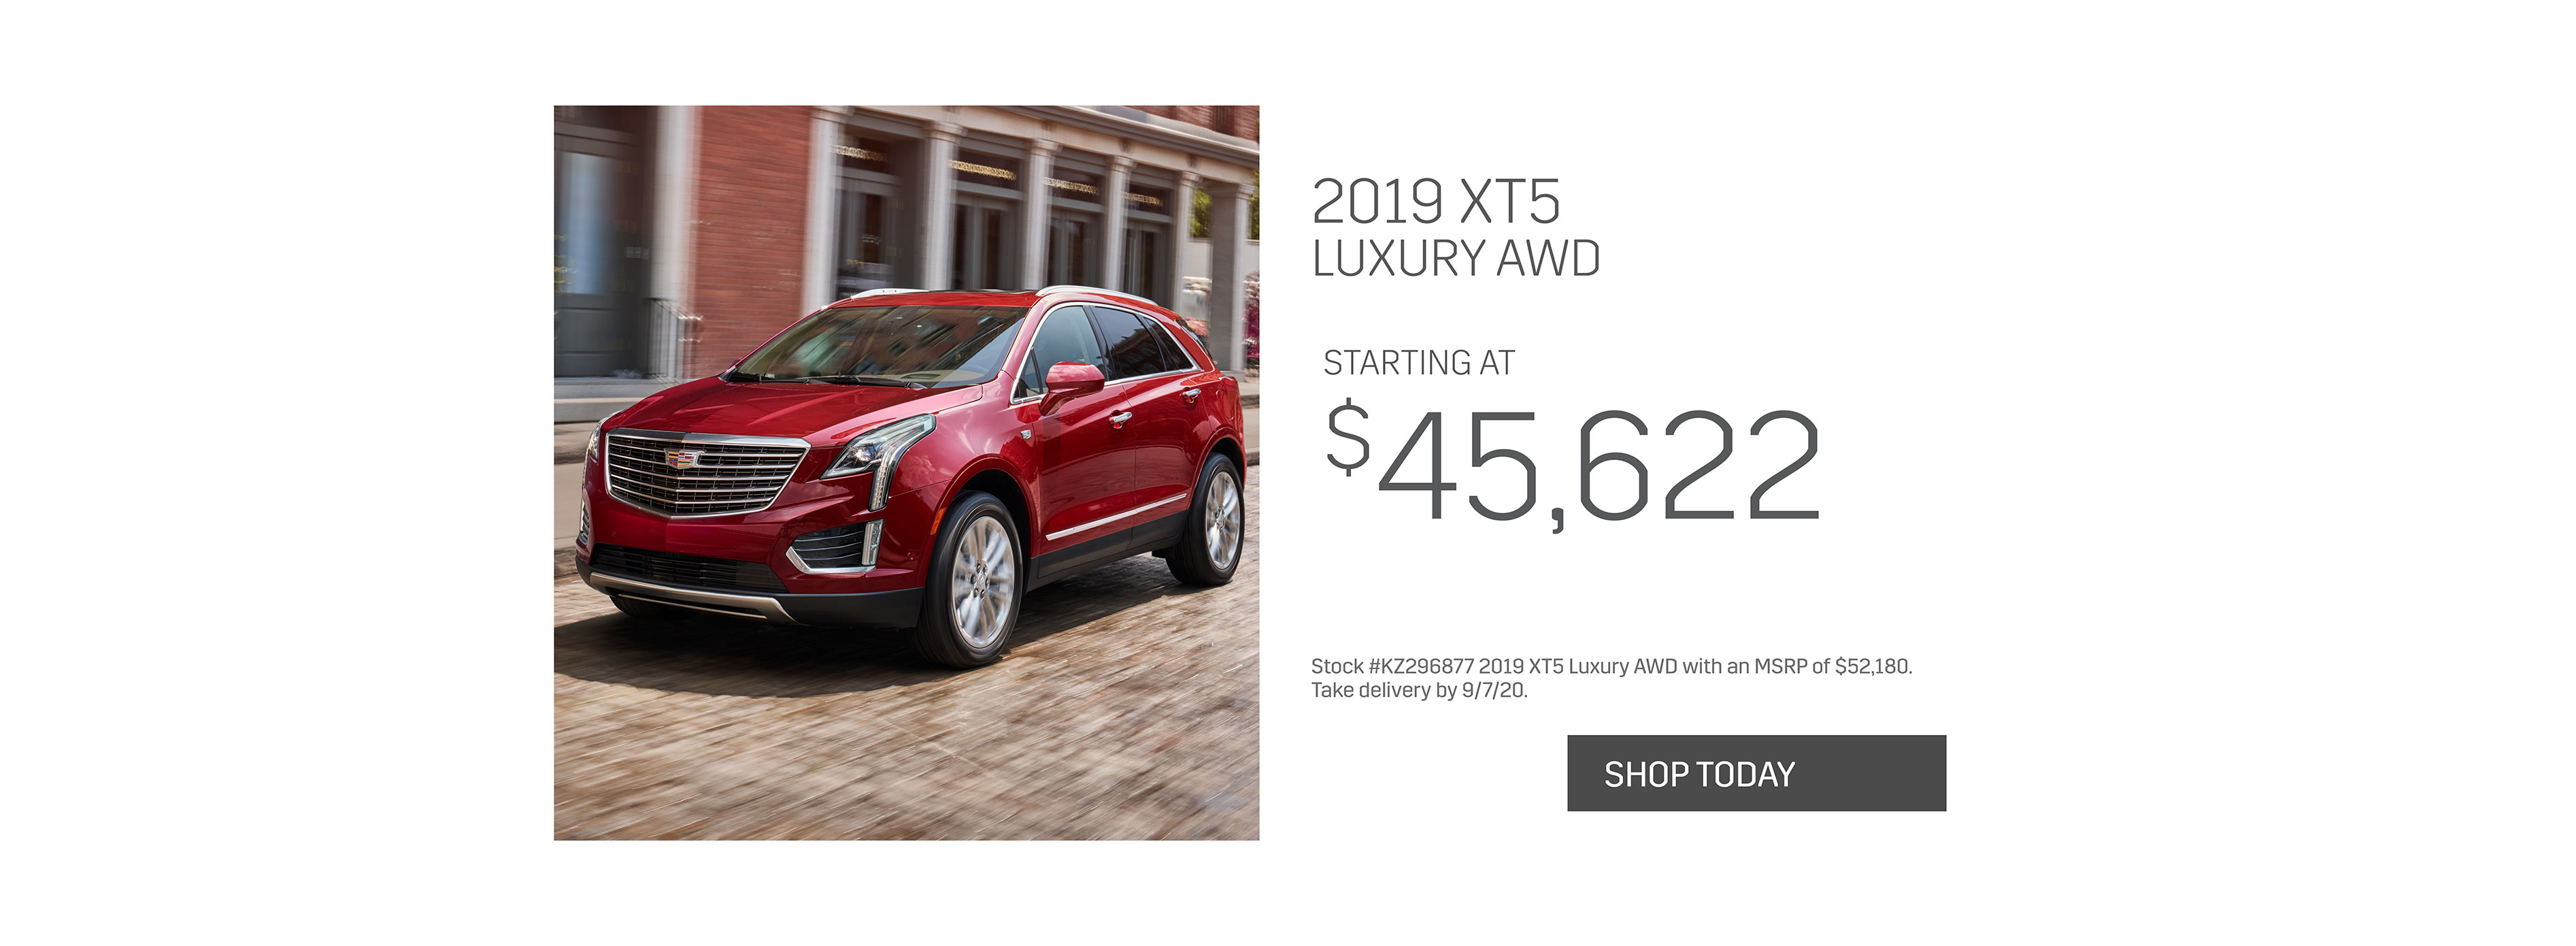 New and Used Cadillac Dealership | Malloy Cadillac ...